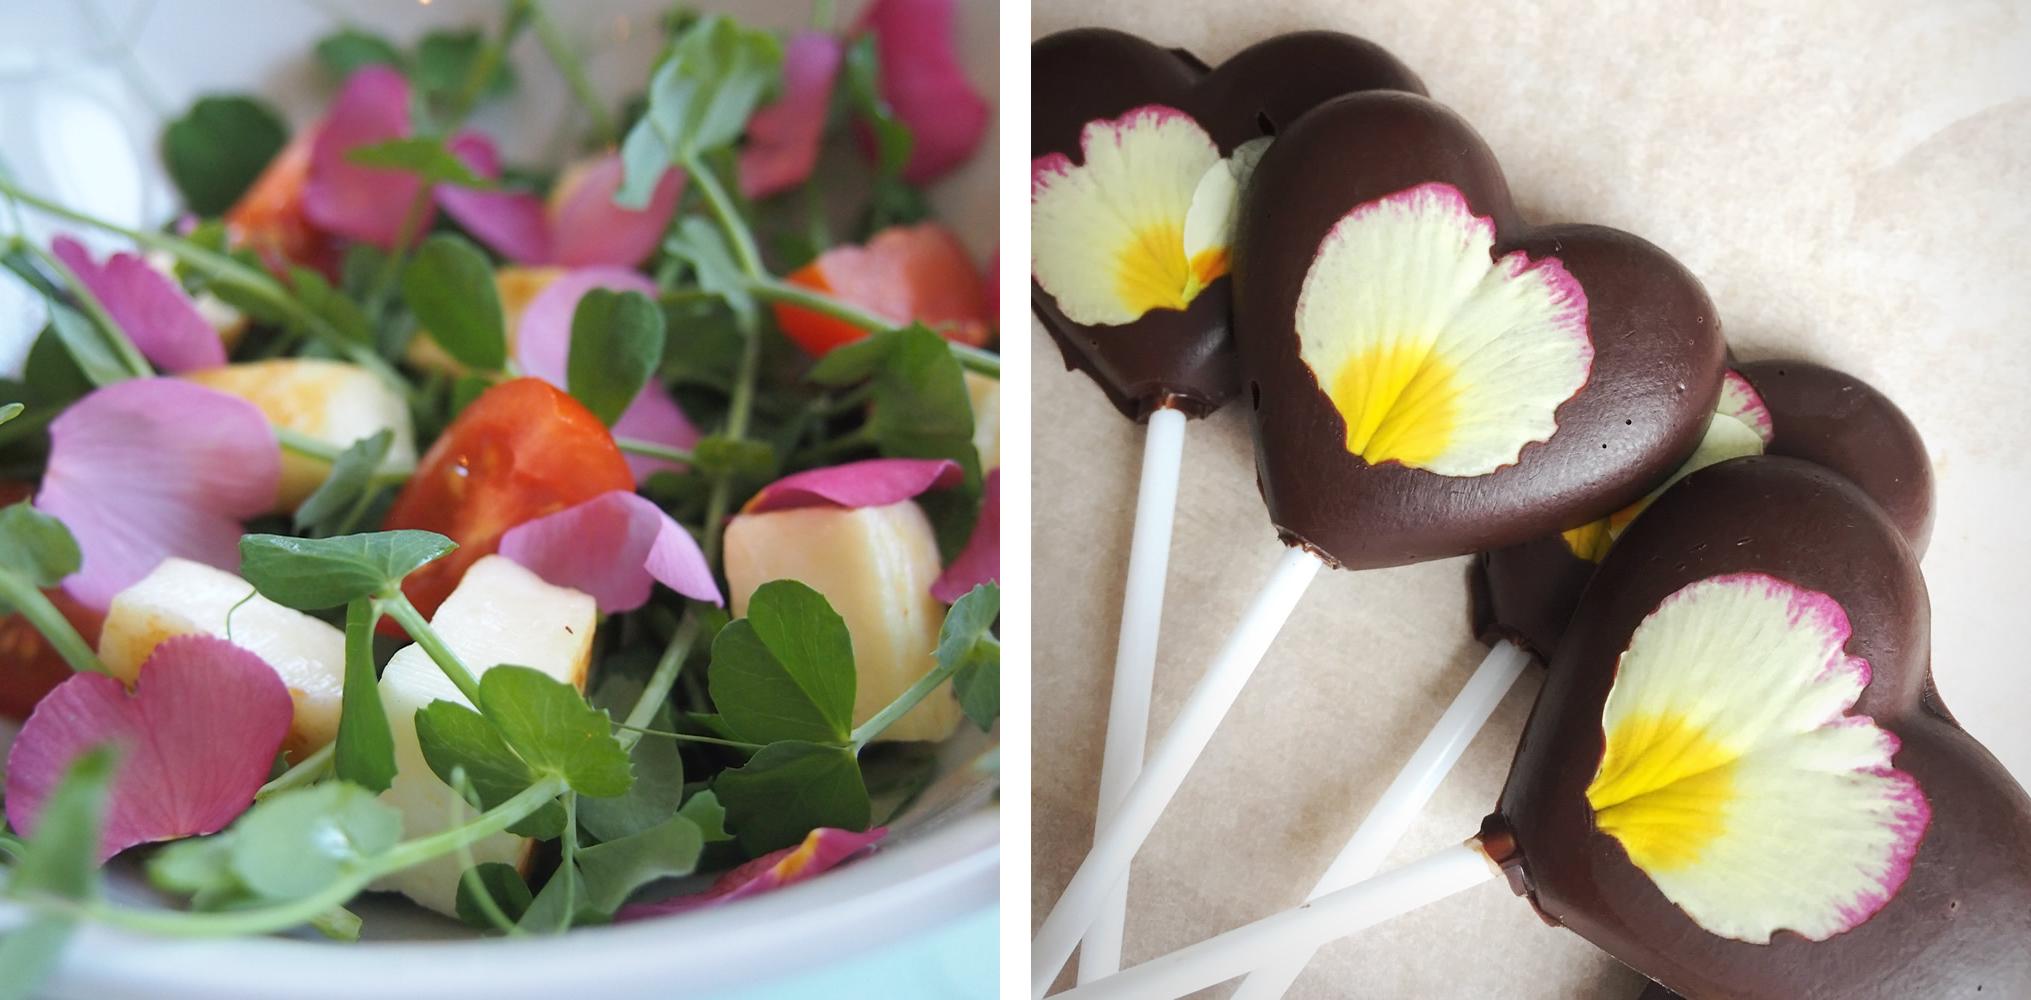 Salad with primrose petals and lollipops with primrose petals